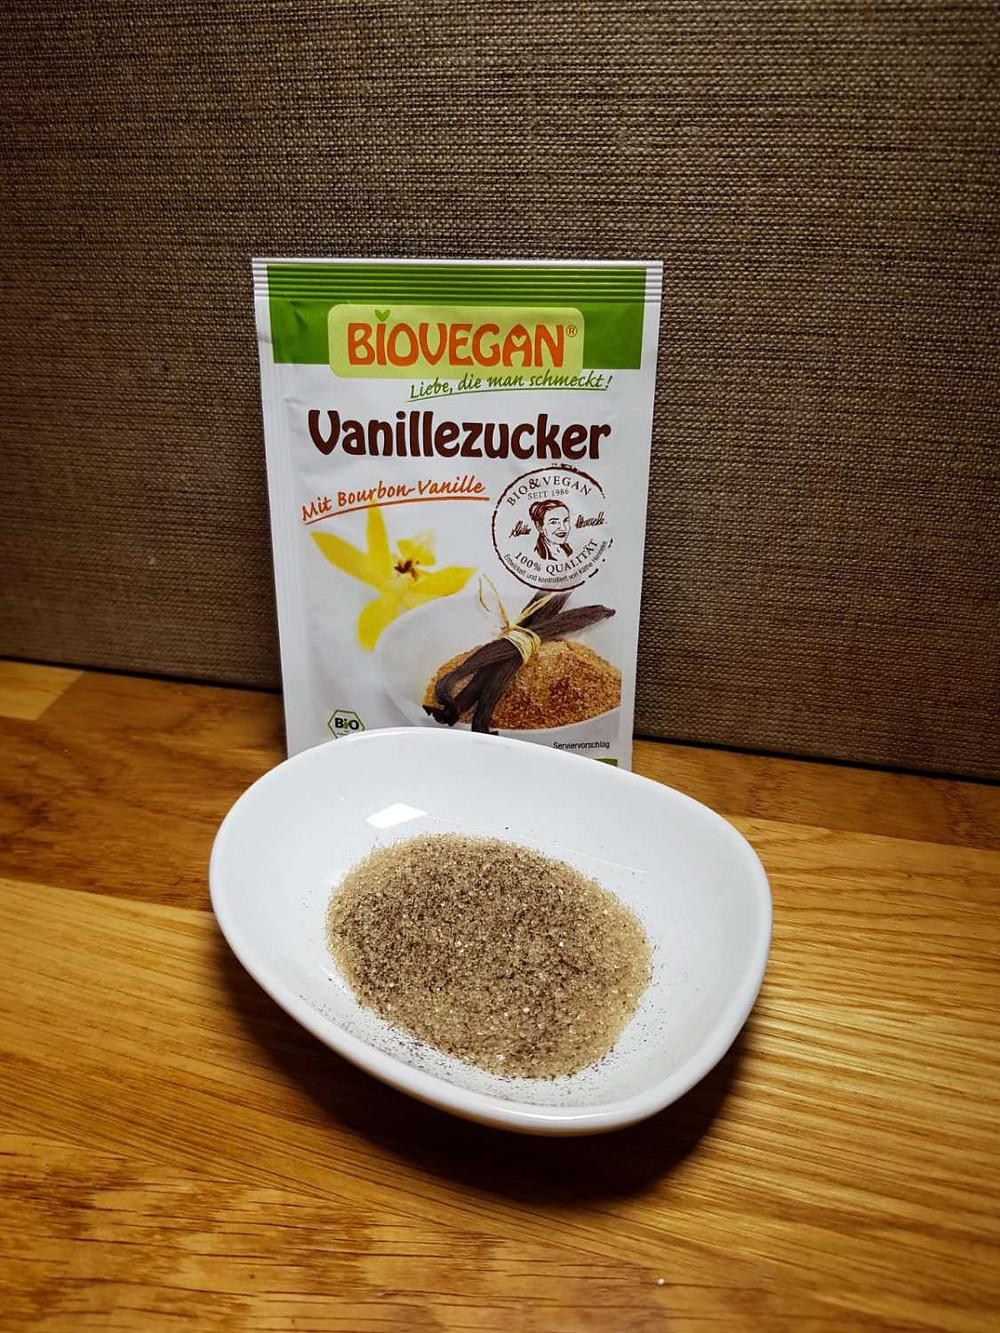 Biovegan Vanillezucker